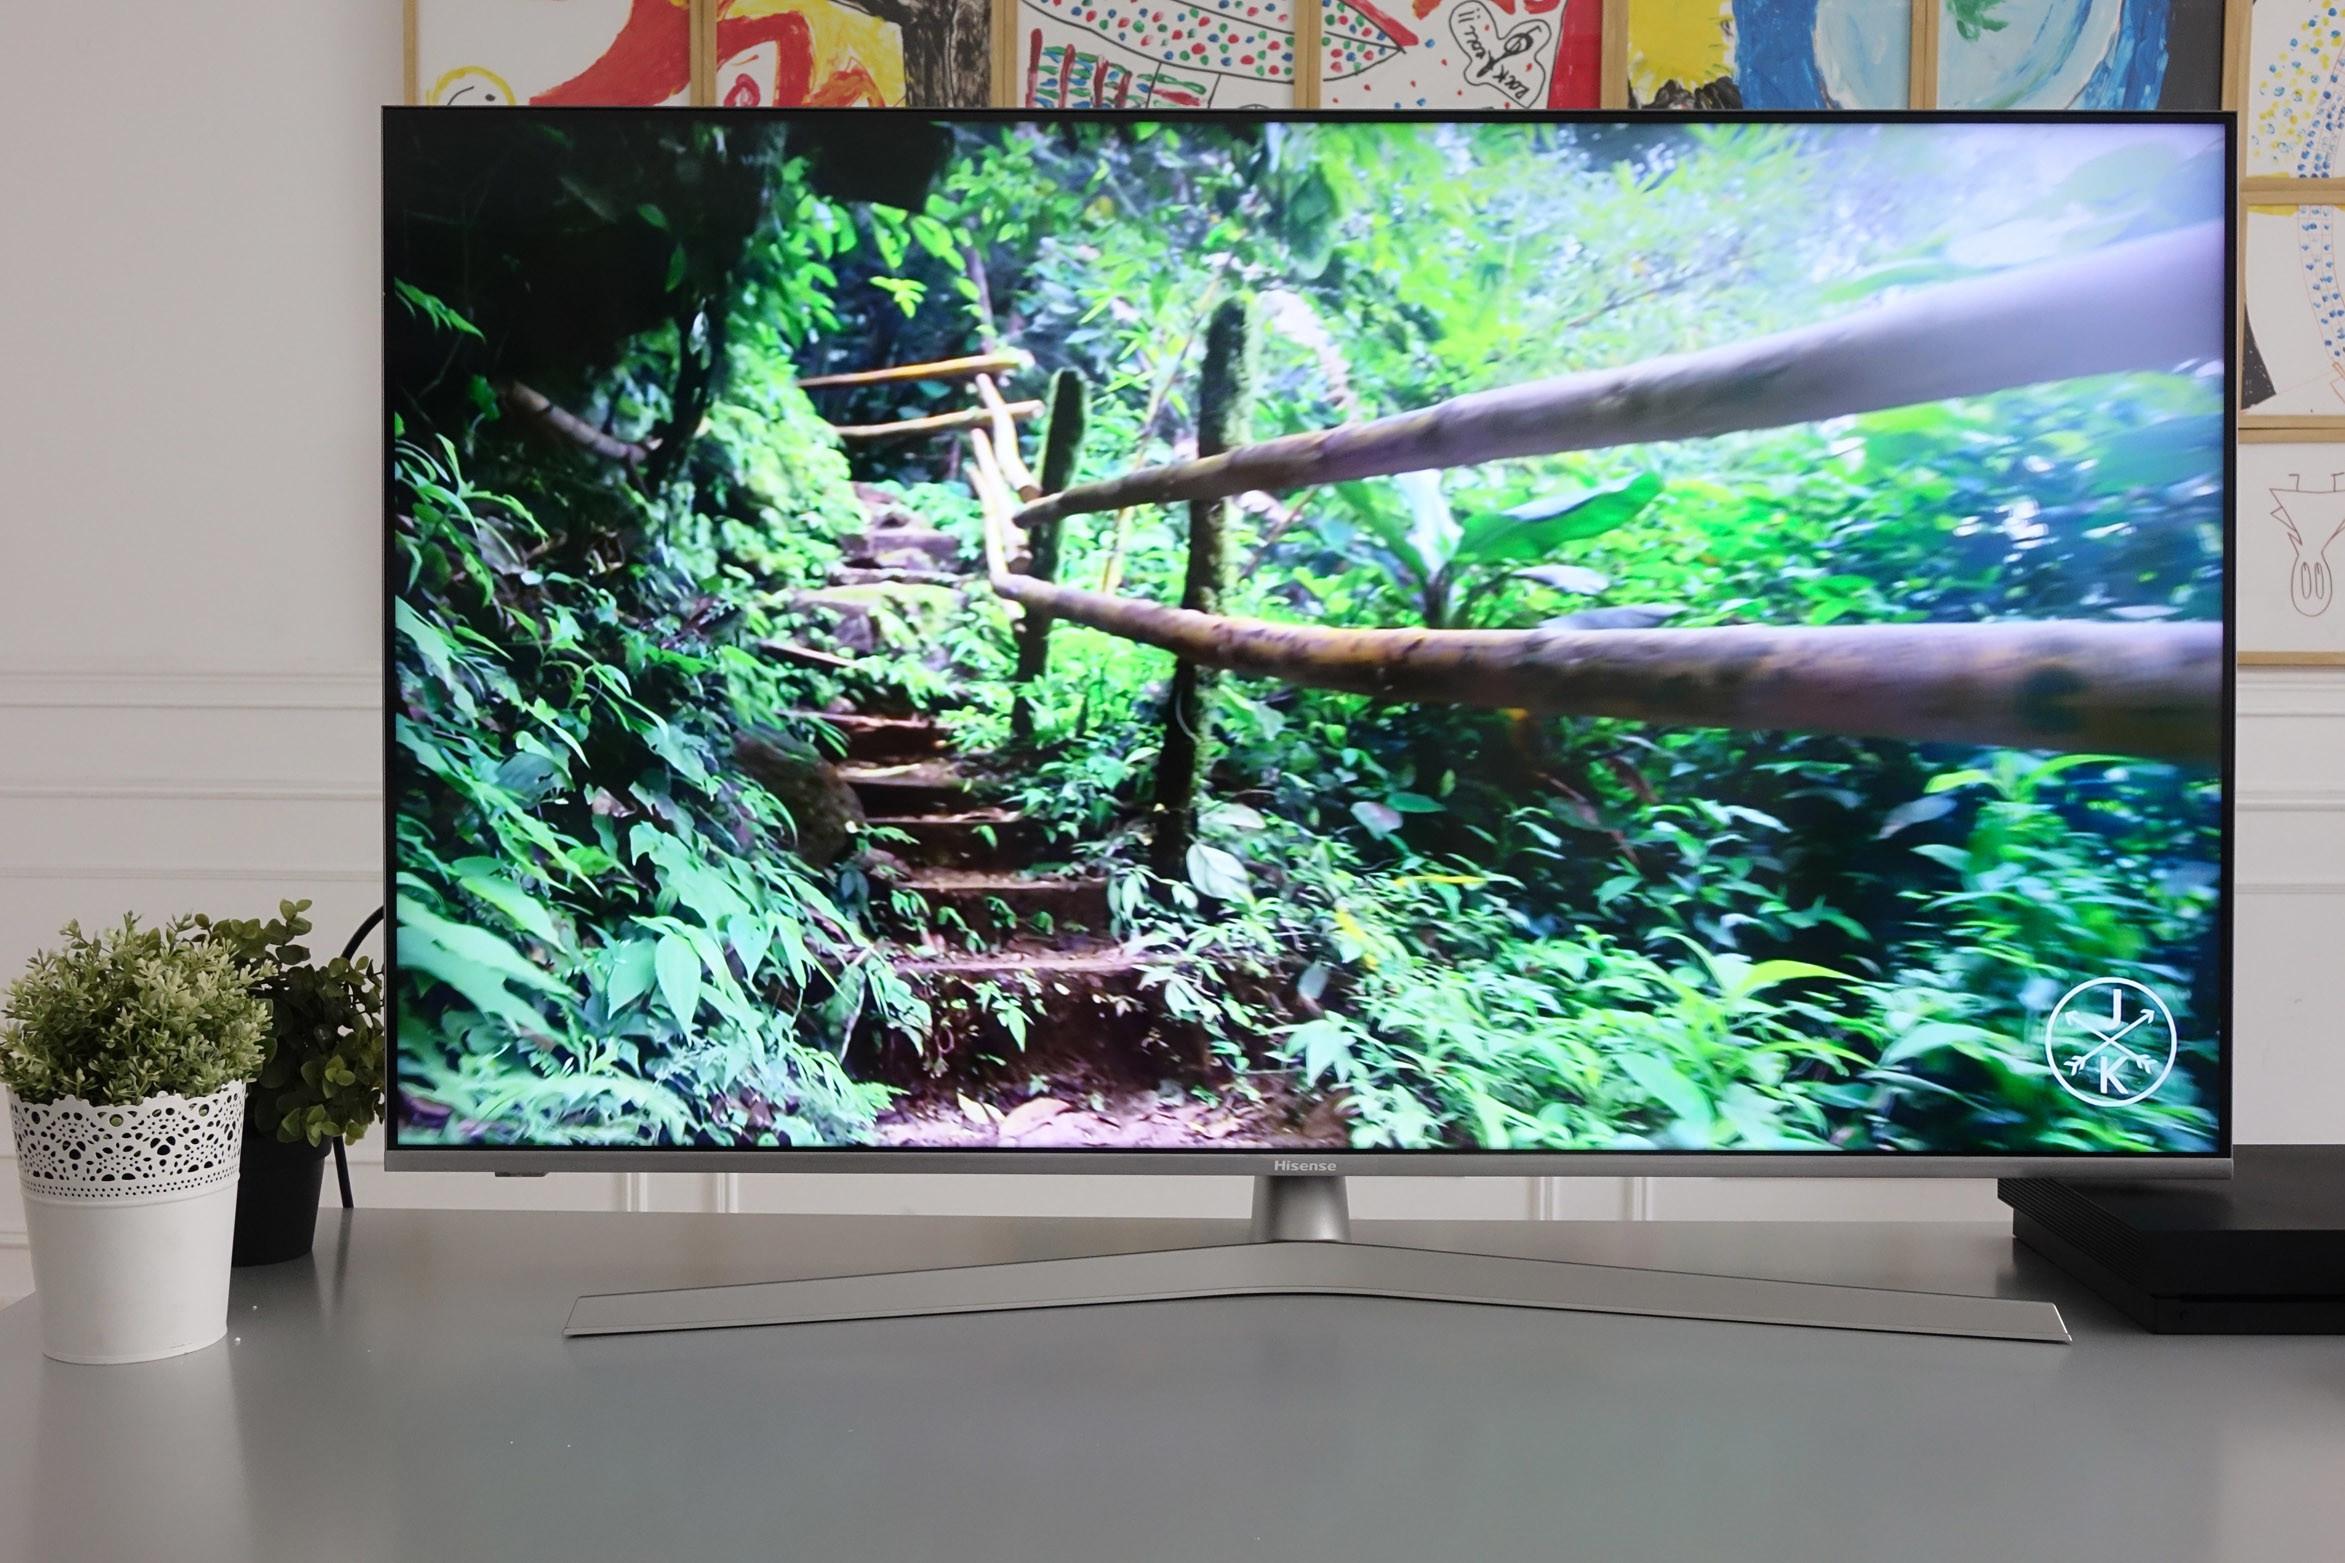 Foto de Televisor Hisense H50U7B ULED 4K UHD (48/48)